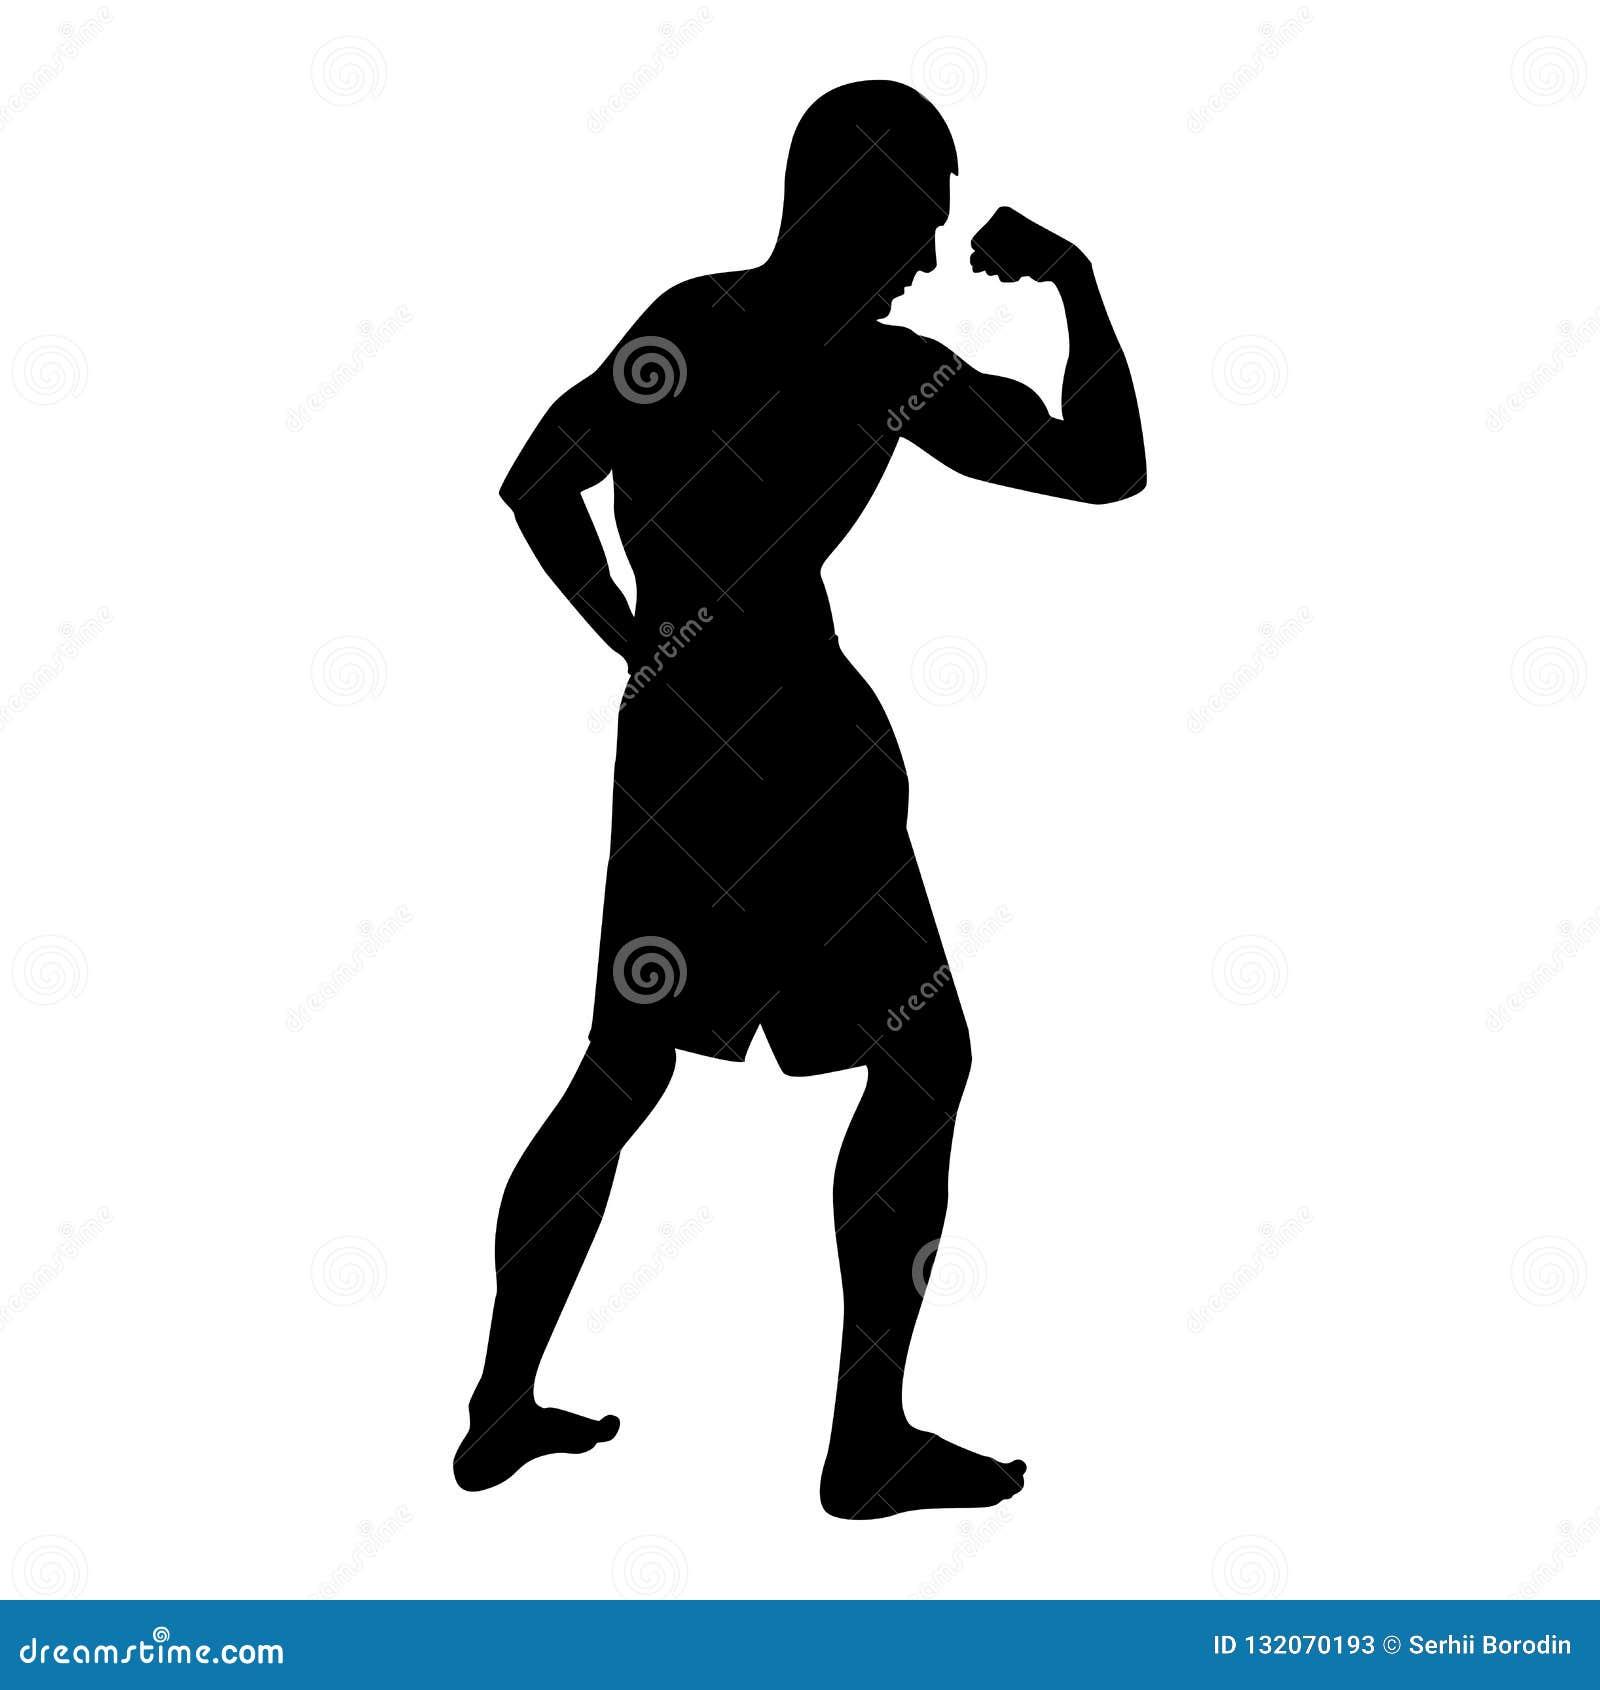 Bodybuilder που παρουσιάζει στη σκιαγραφία αθλητικής έννοιας Bodybuilding μυών δικέφαλων μυών εικονίδιο πλάγιας όψης μαύρη έγχρωμ